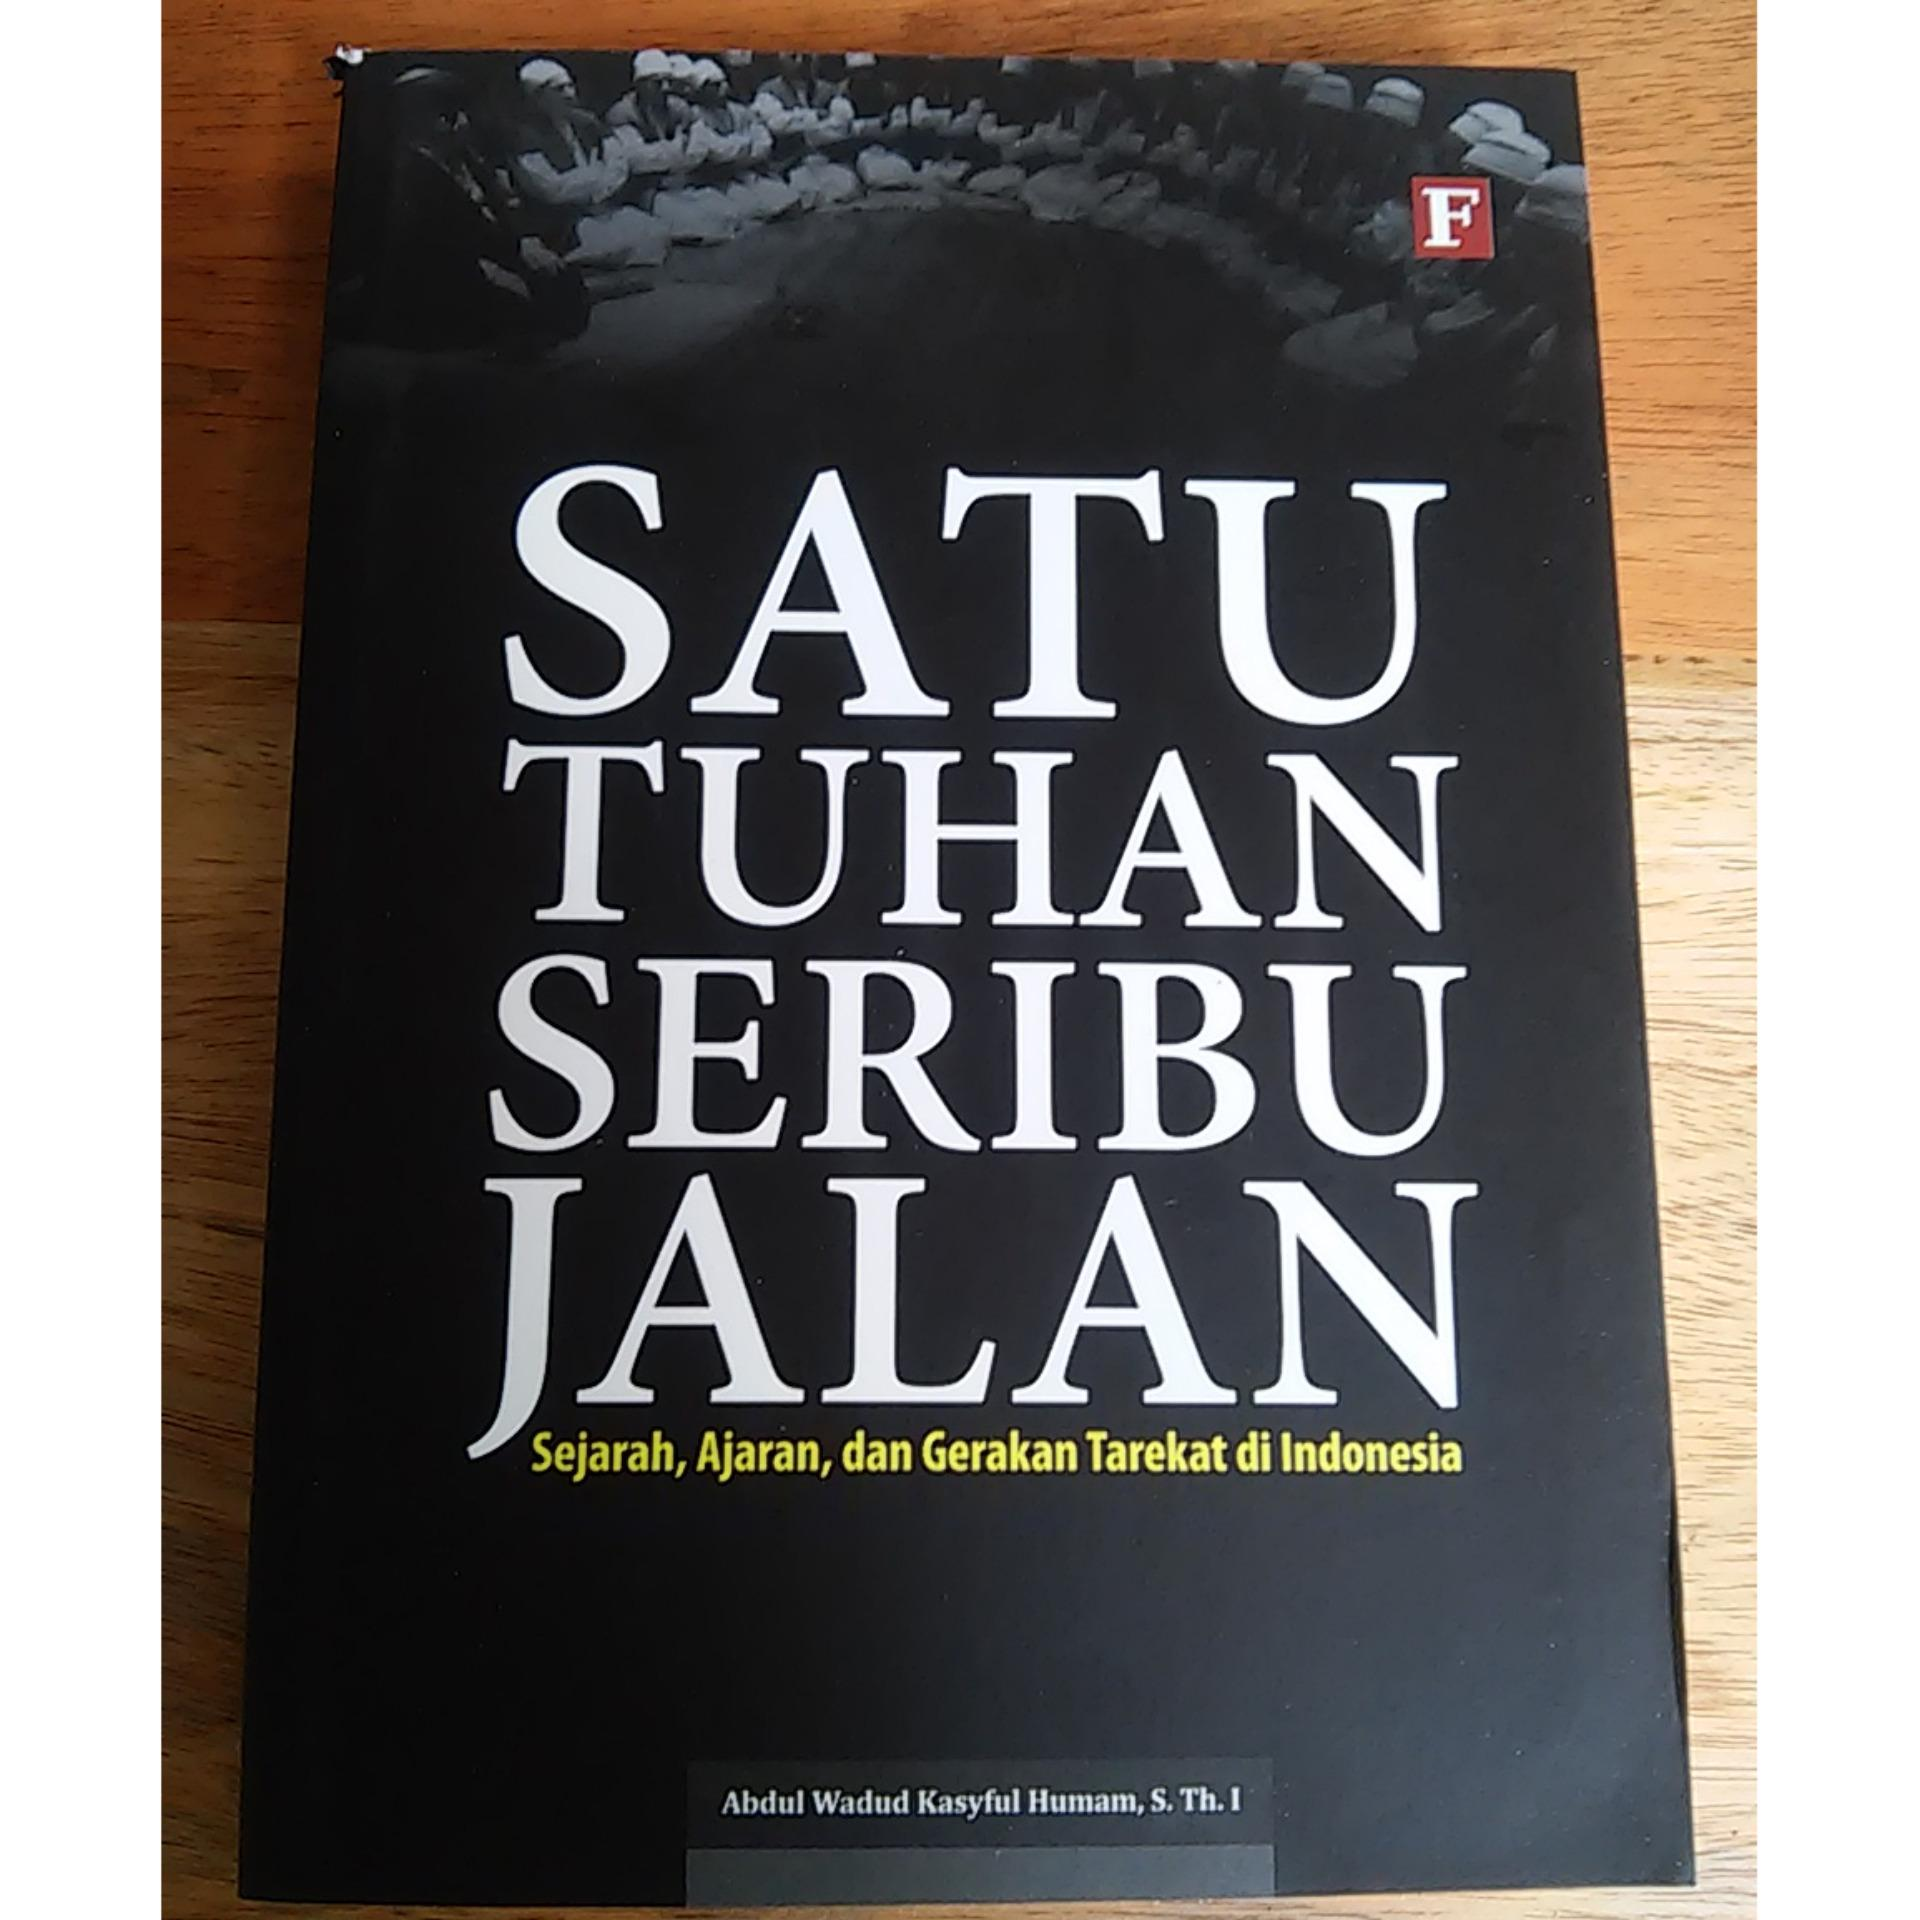 Cheap online Satu Tuhan Seribu Jalan: Sejarah, Ajaran dan Gerakan Tarekat di Indonesia -